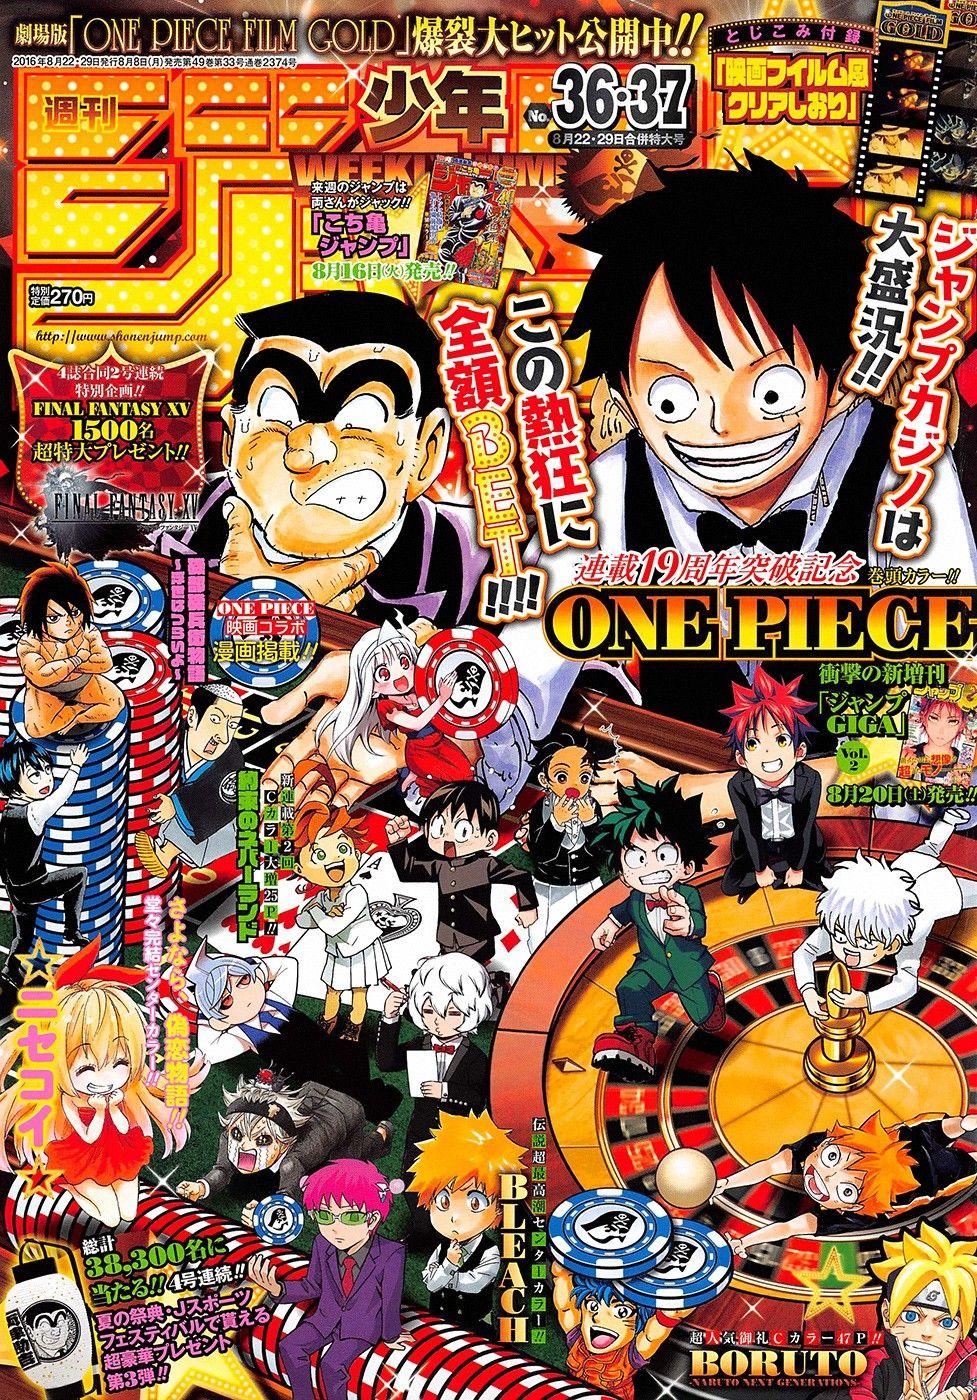 One Piece 835 Vostfr : piece, vostfr, Piece, Manga, Anime, Piece,, Crossover,, Covers